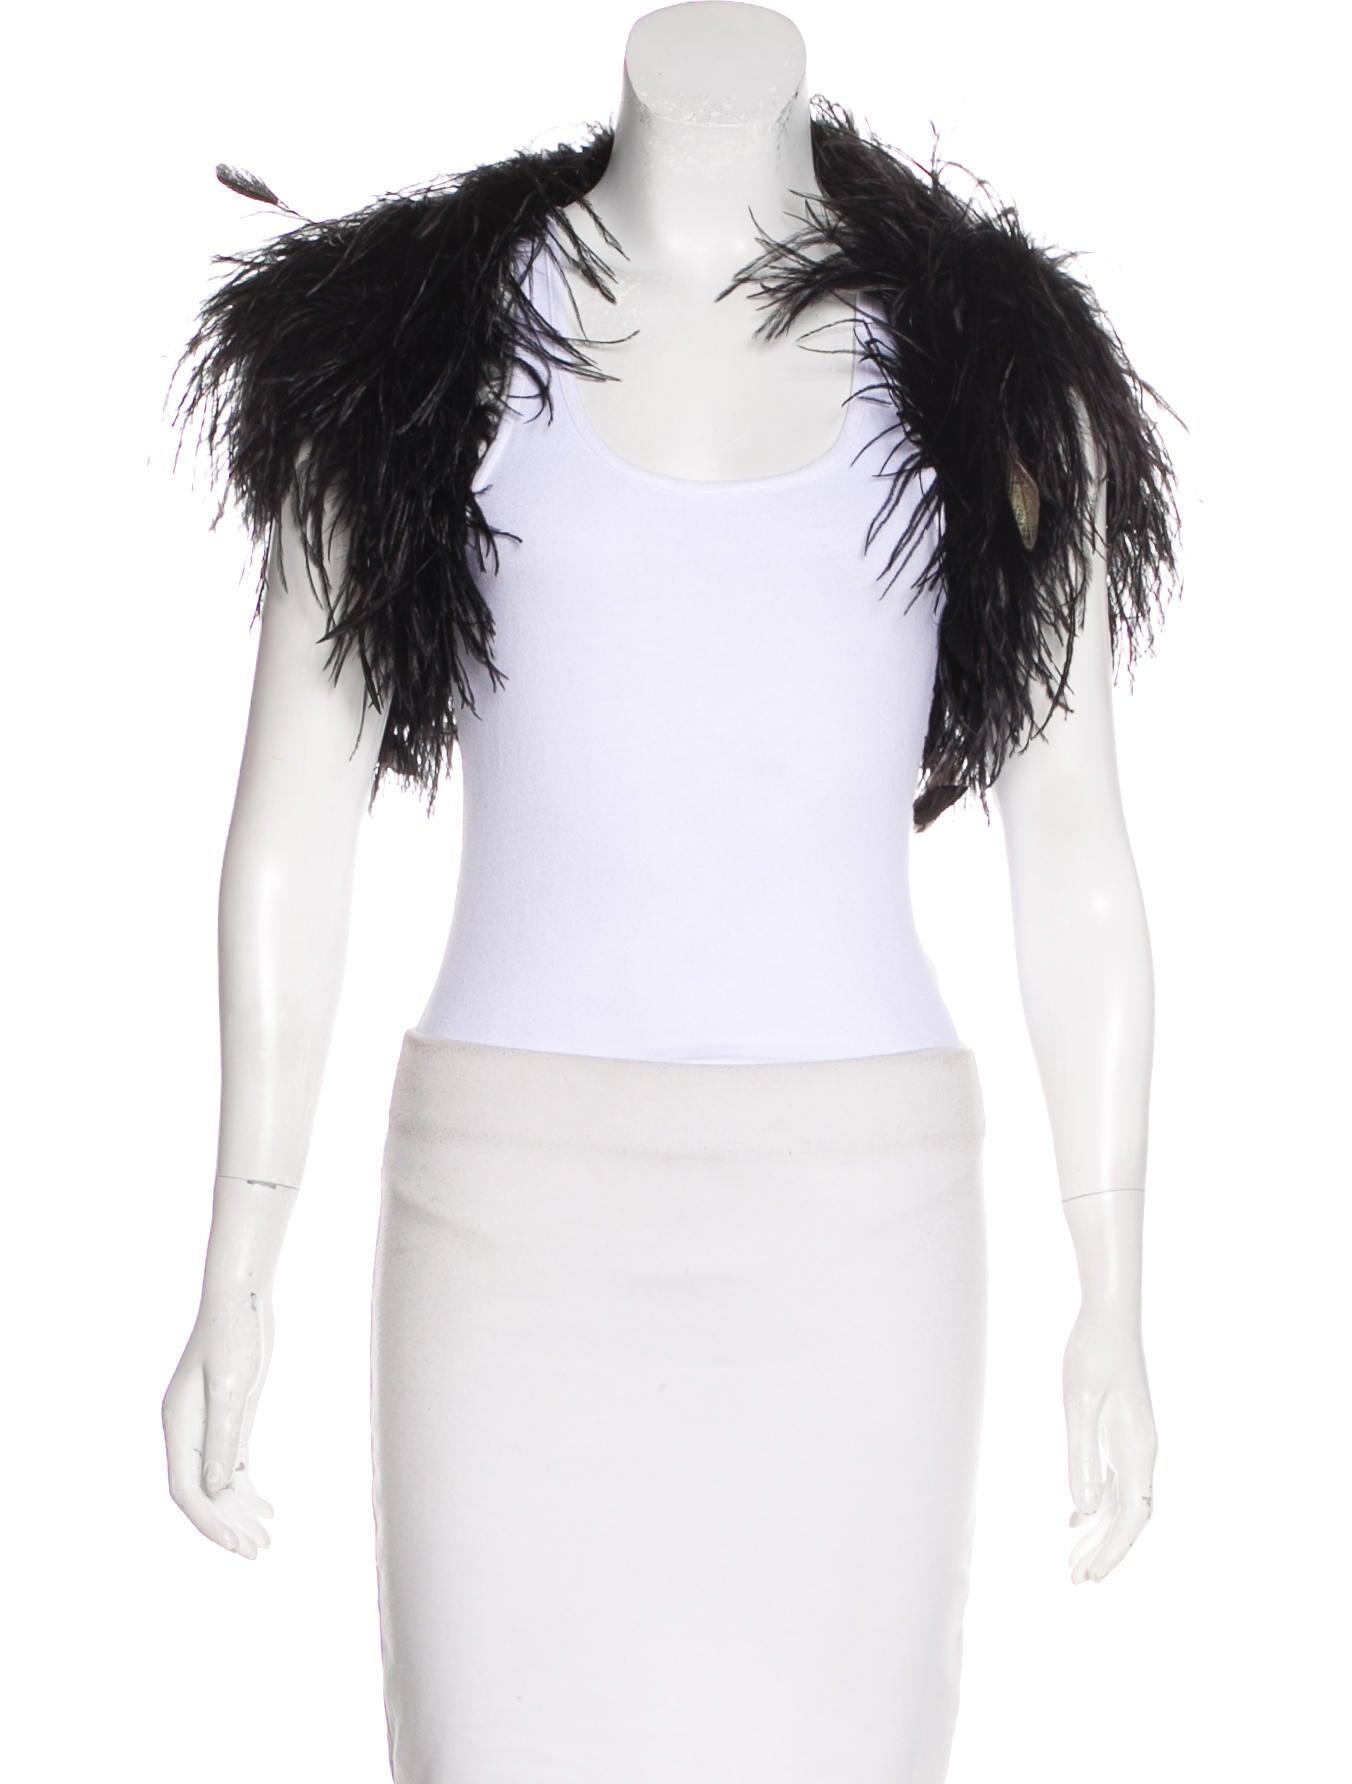 27b7bed53ac Ralph Lauren Black Label Ostrich Feather Jacket - Clothing ...